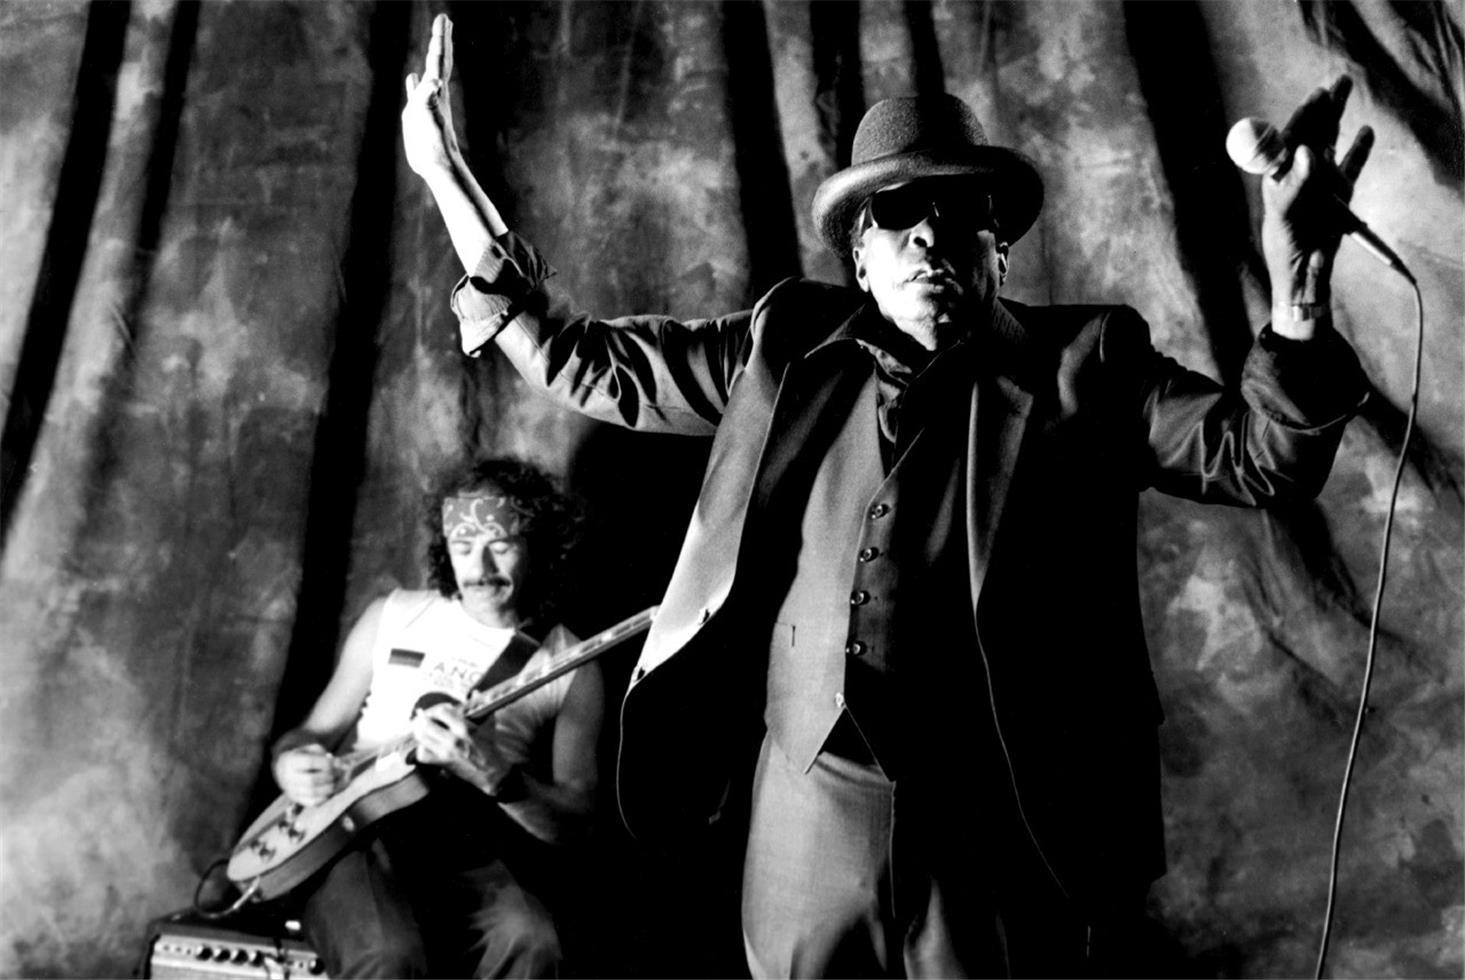 John Lee Hooker with Carlos Santana